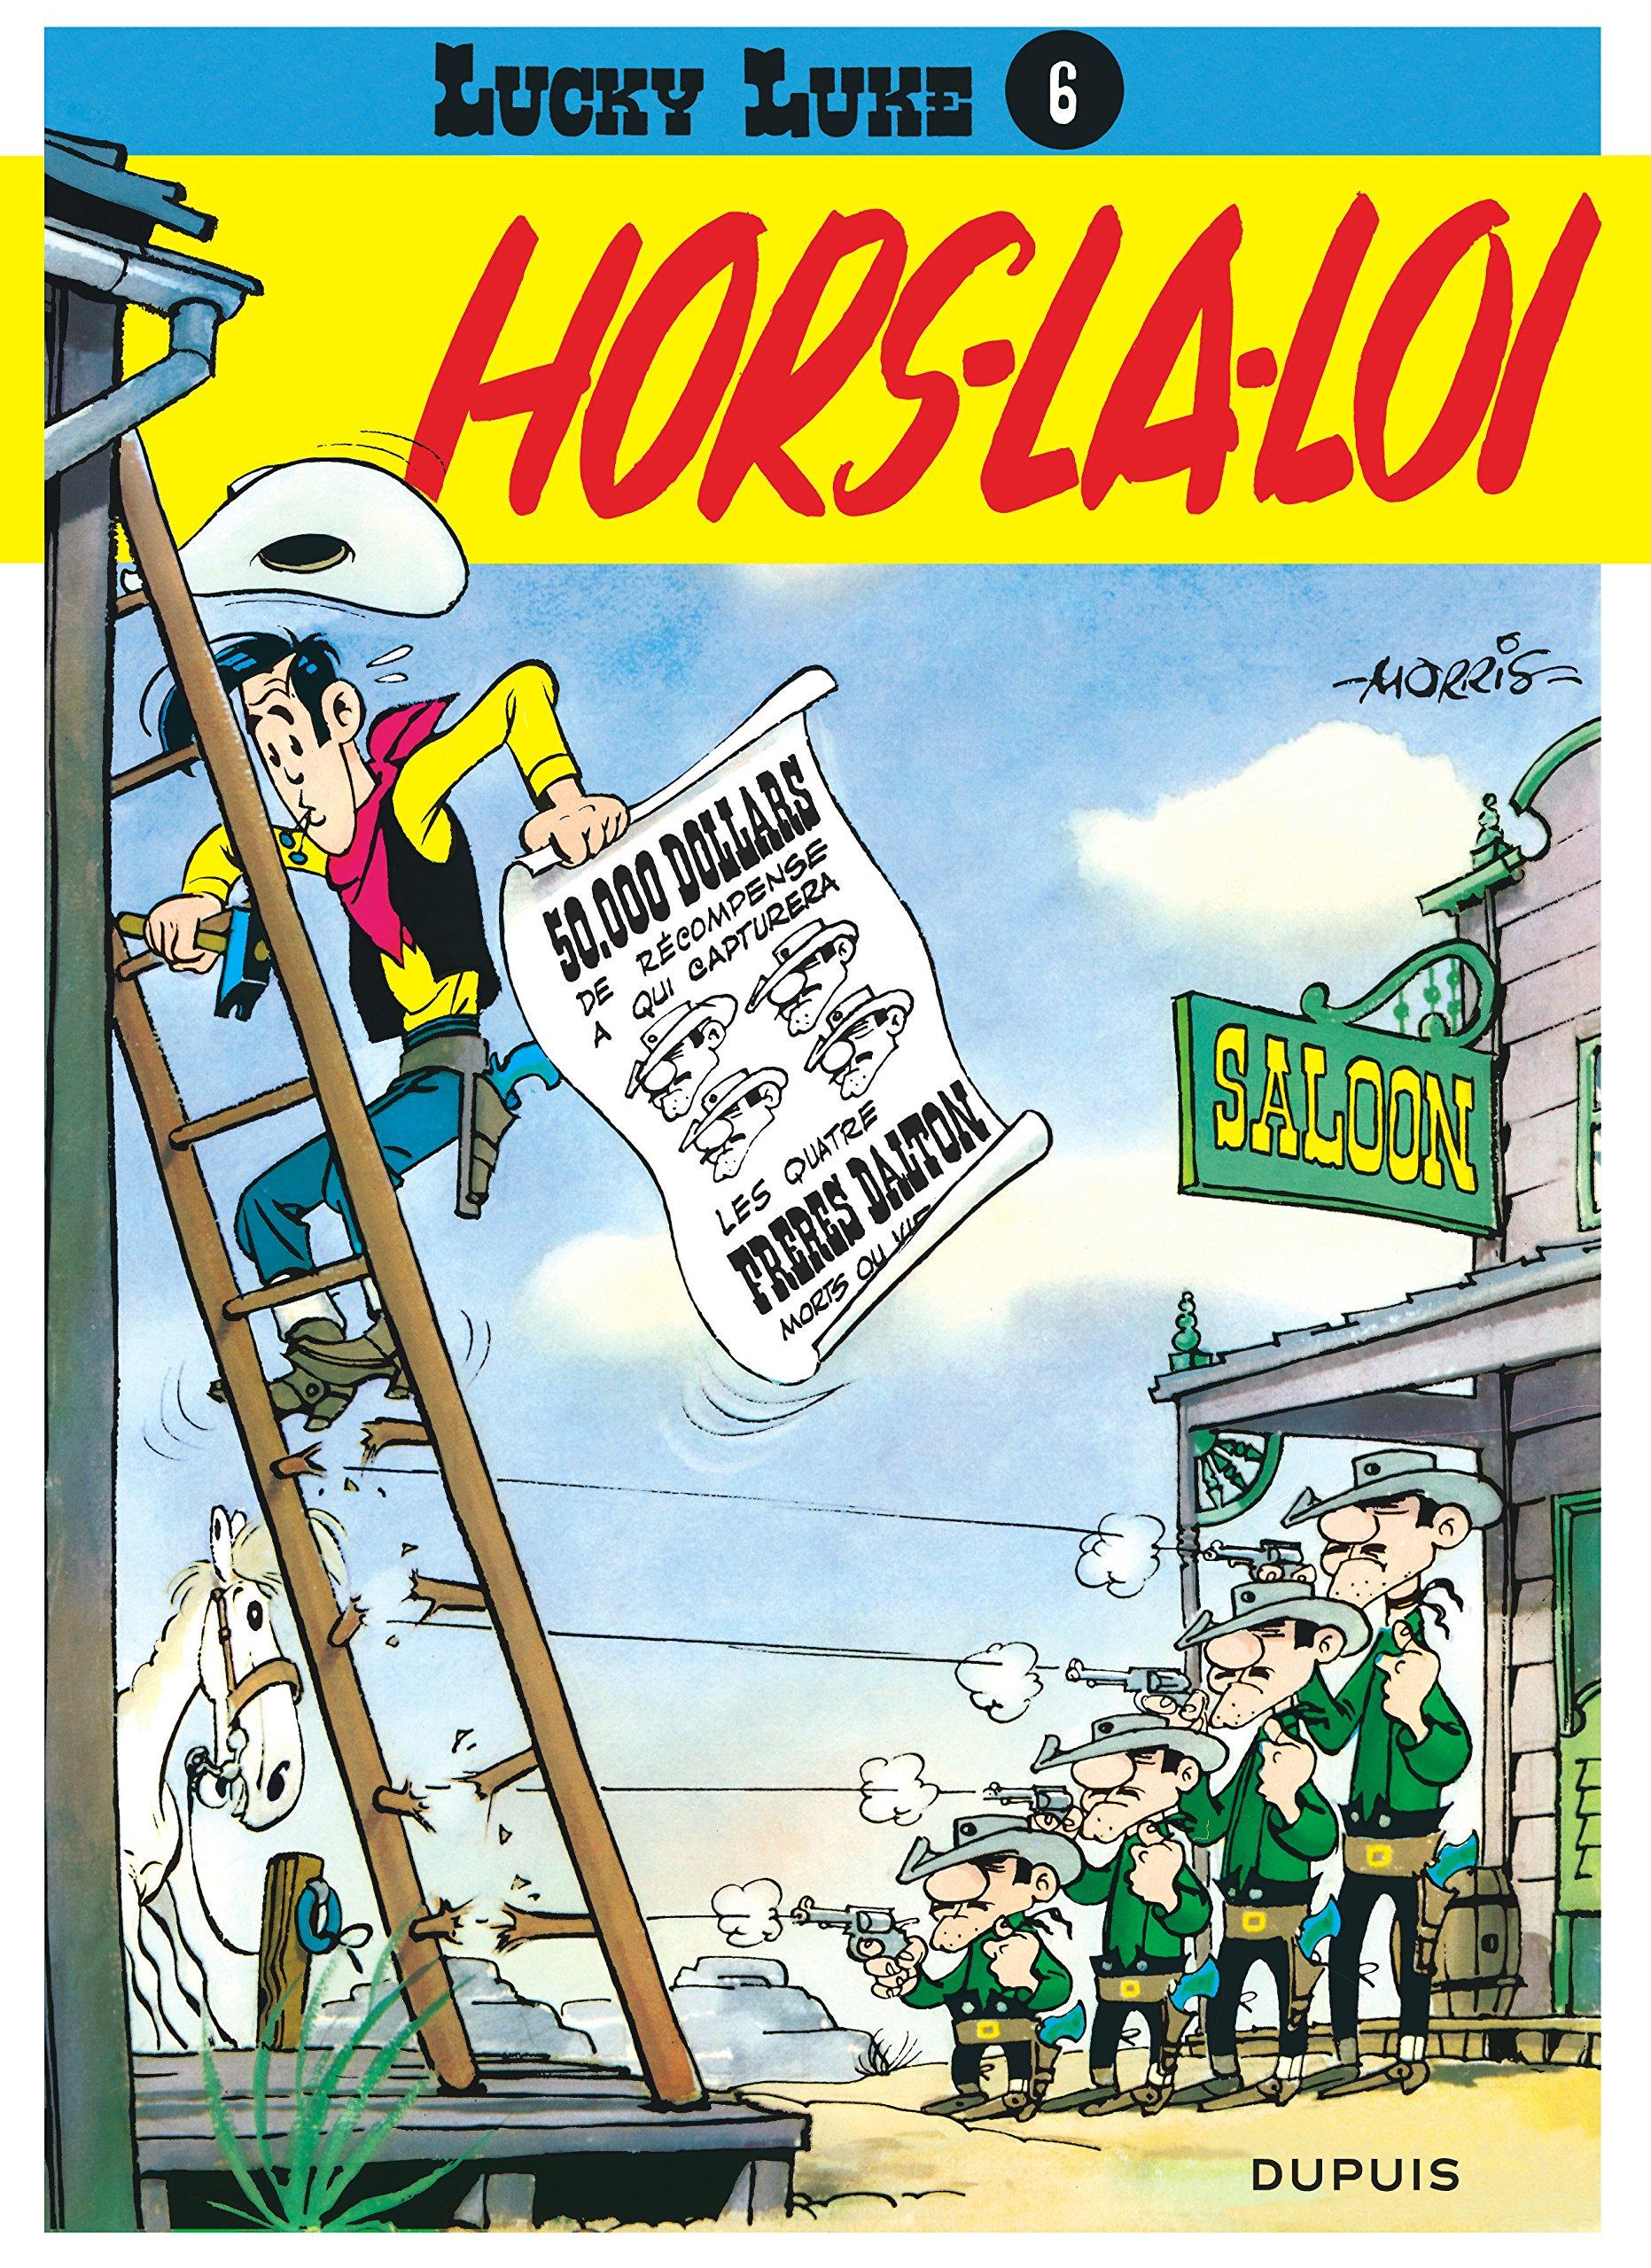 French Comics Pdf